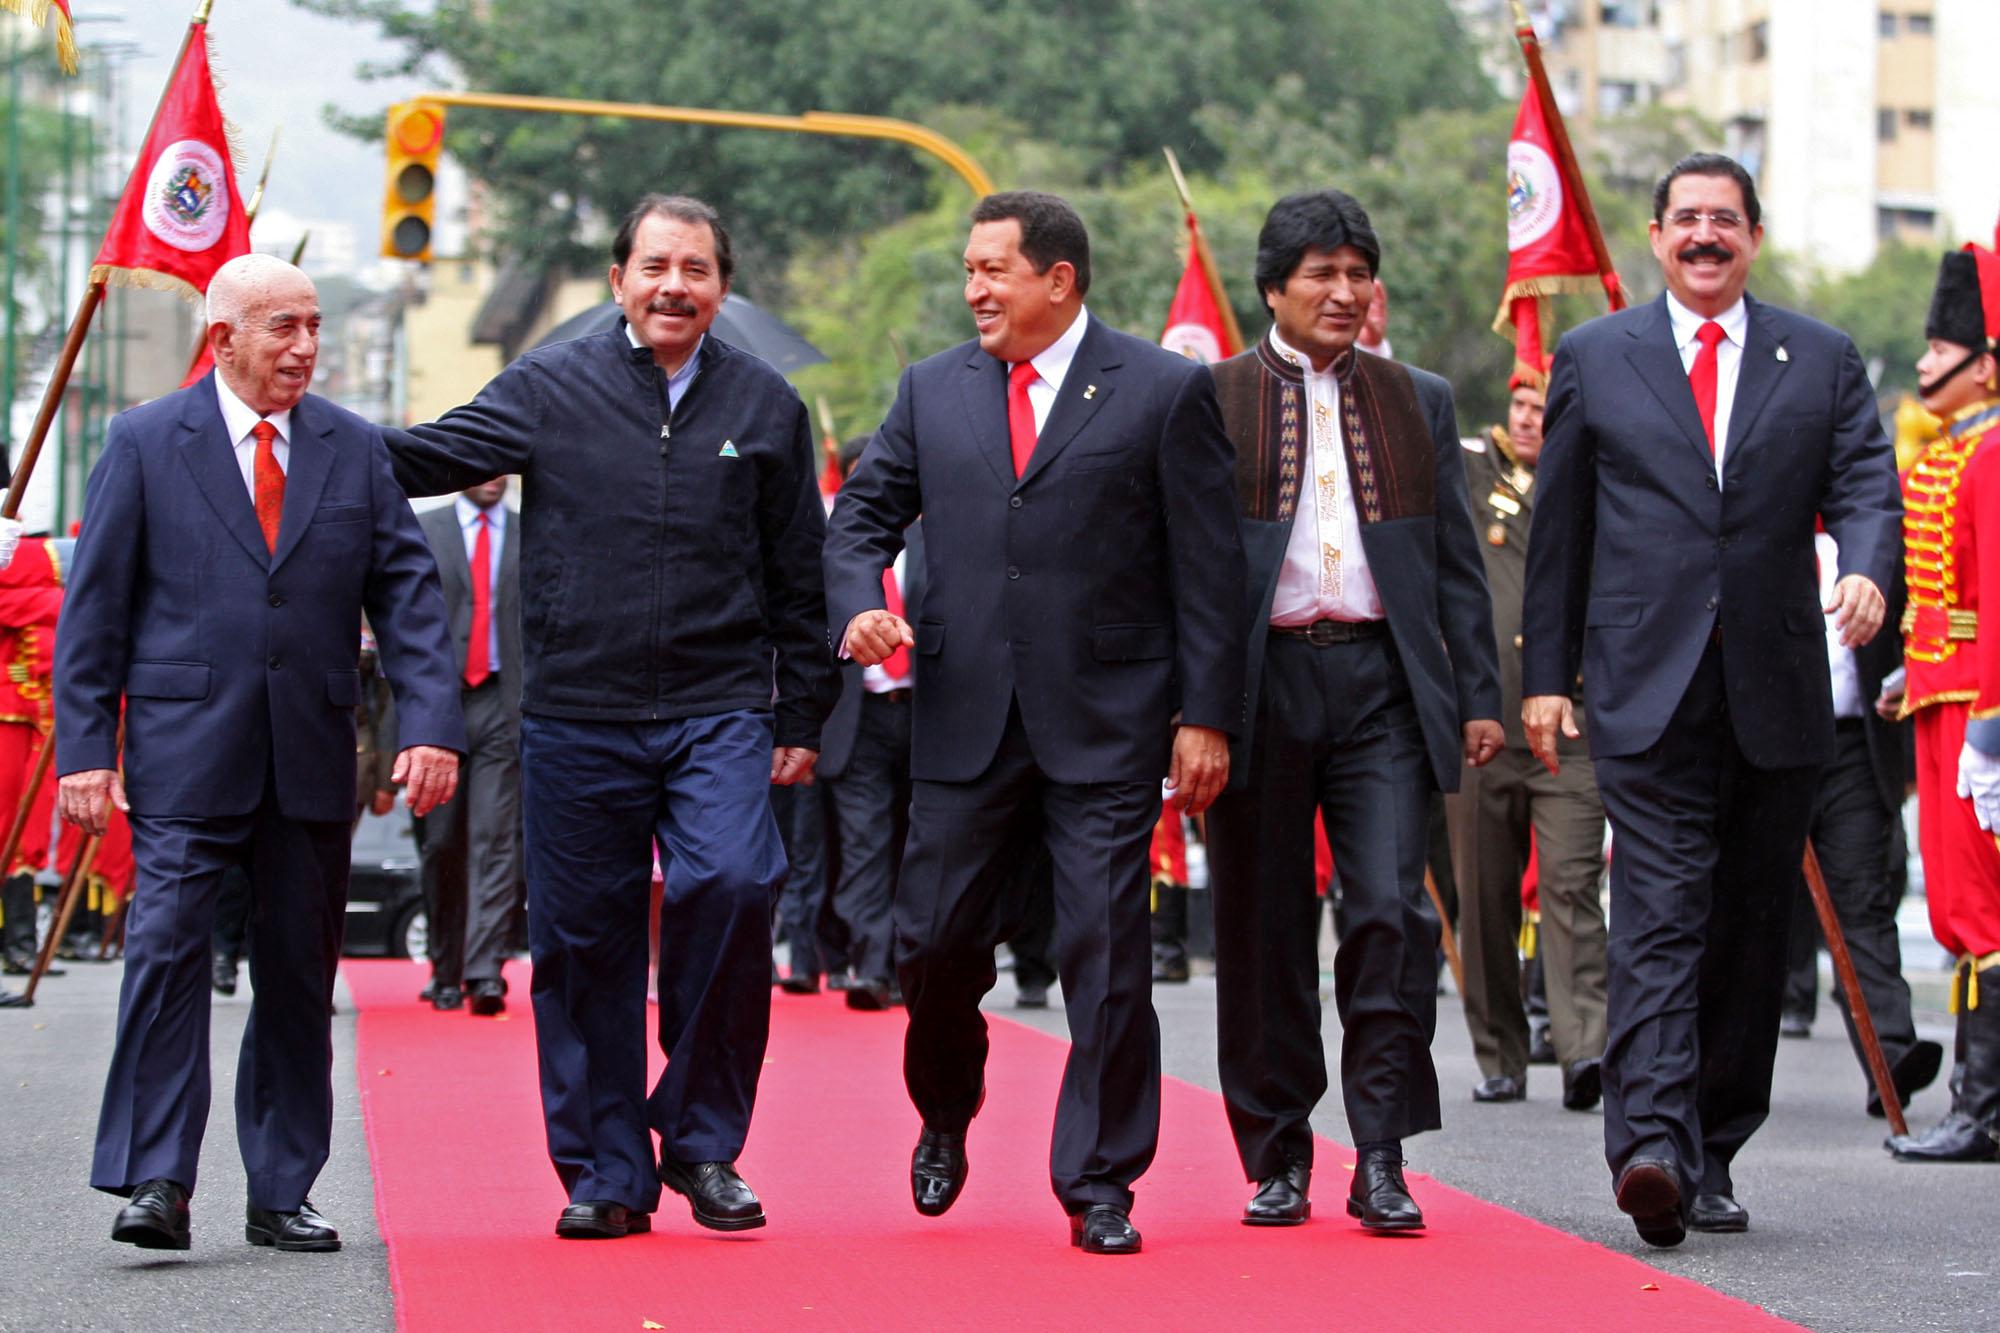 La tercera década latinoamericana Por Emir Sader, Cubadebate